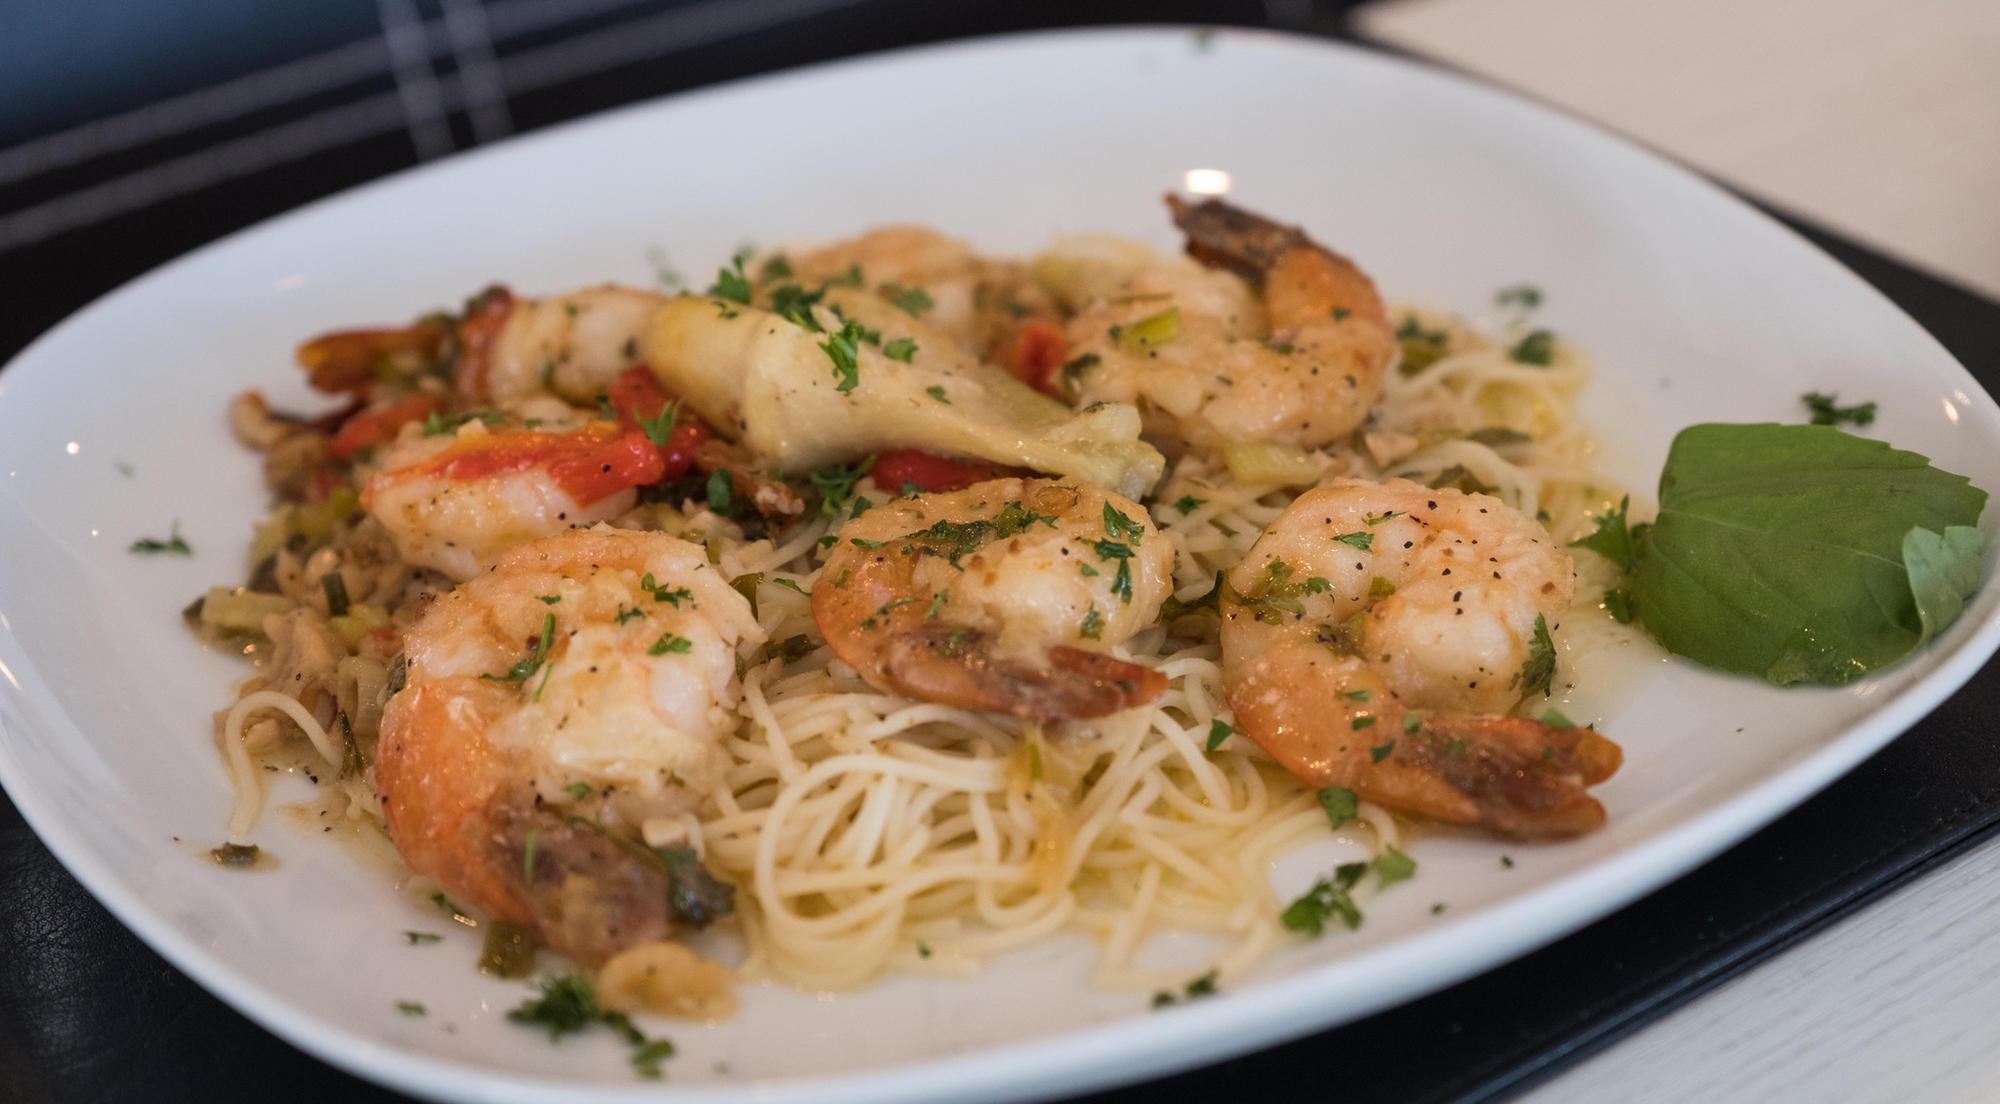 Restaurant Review: Vivo Italian Kitchen in South Whitehall - The ...